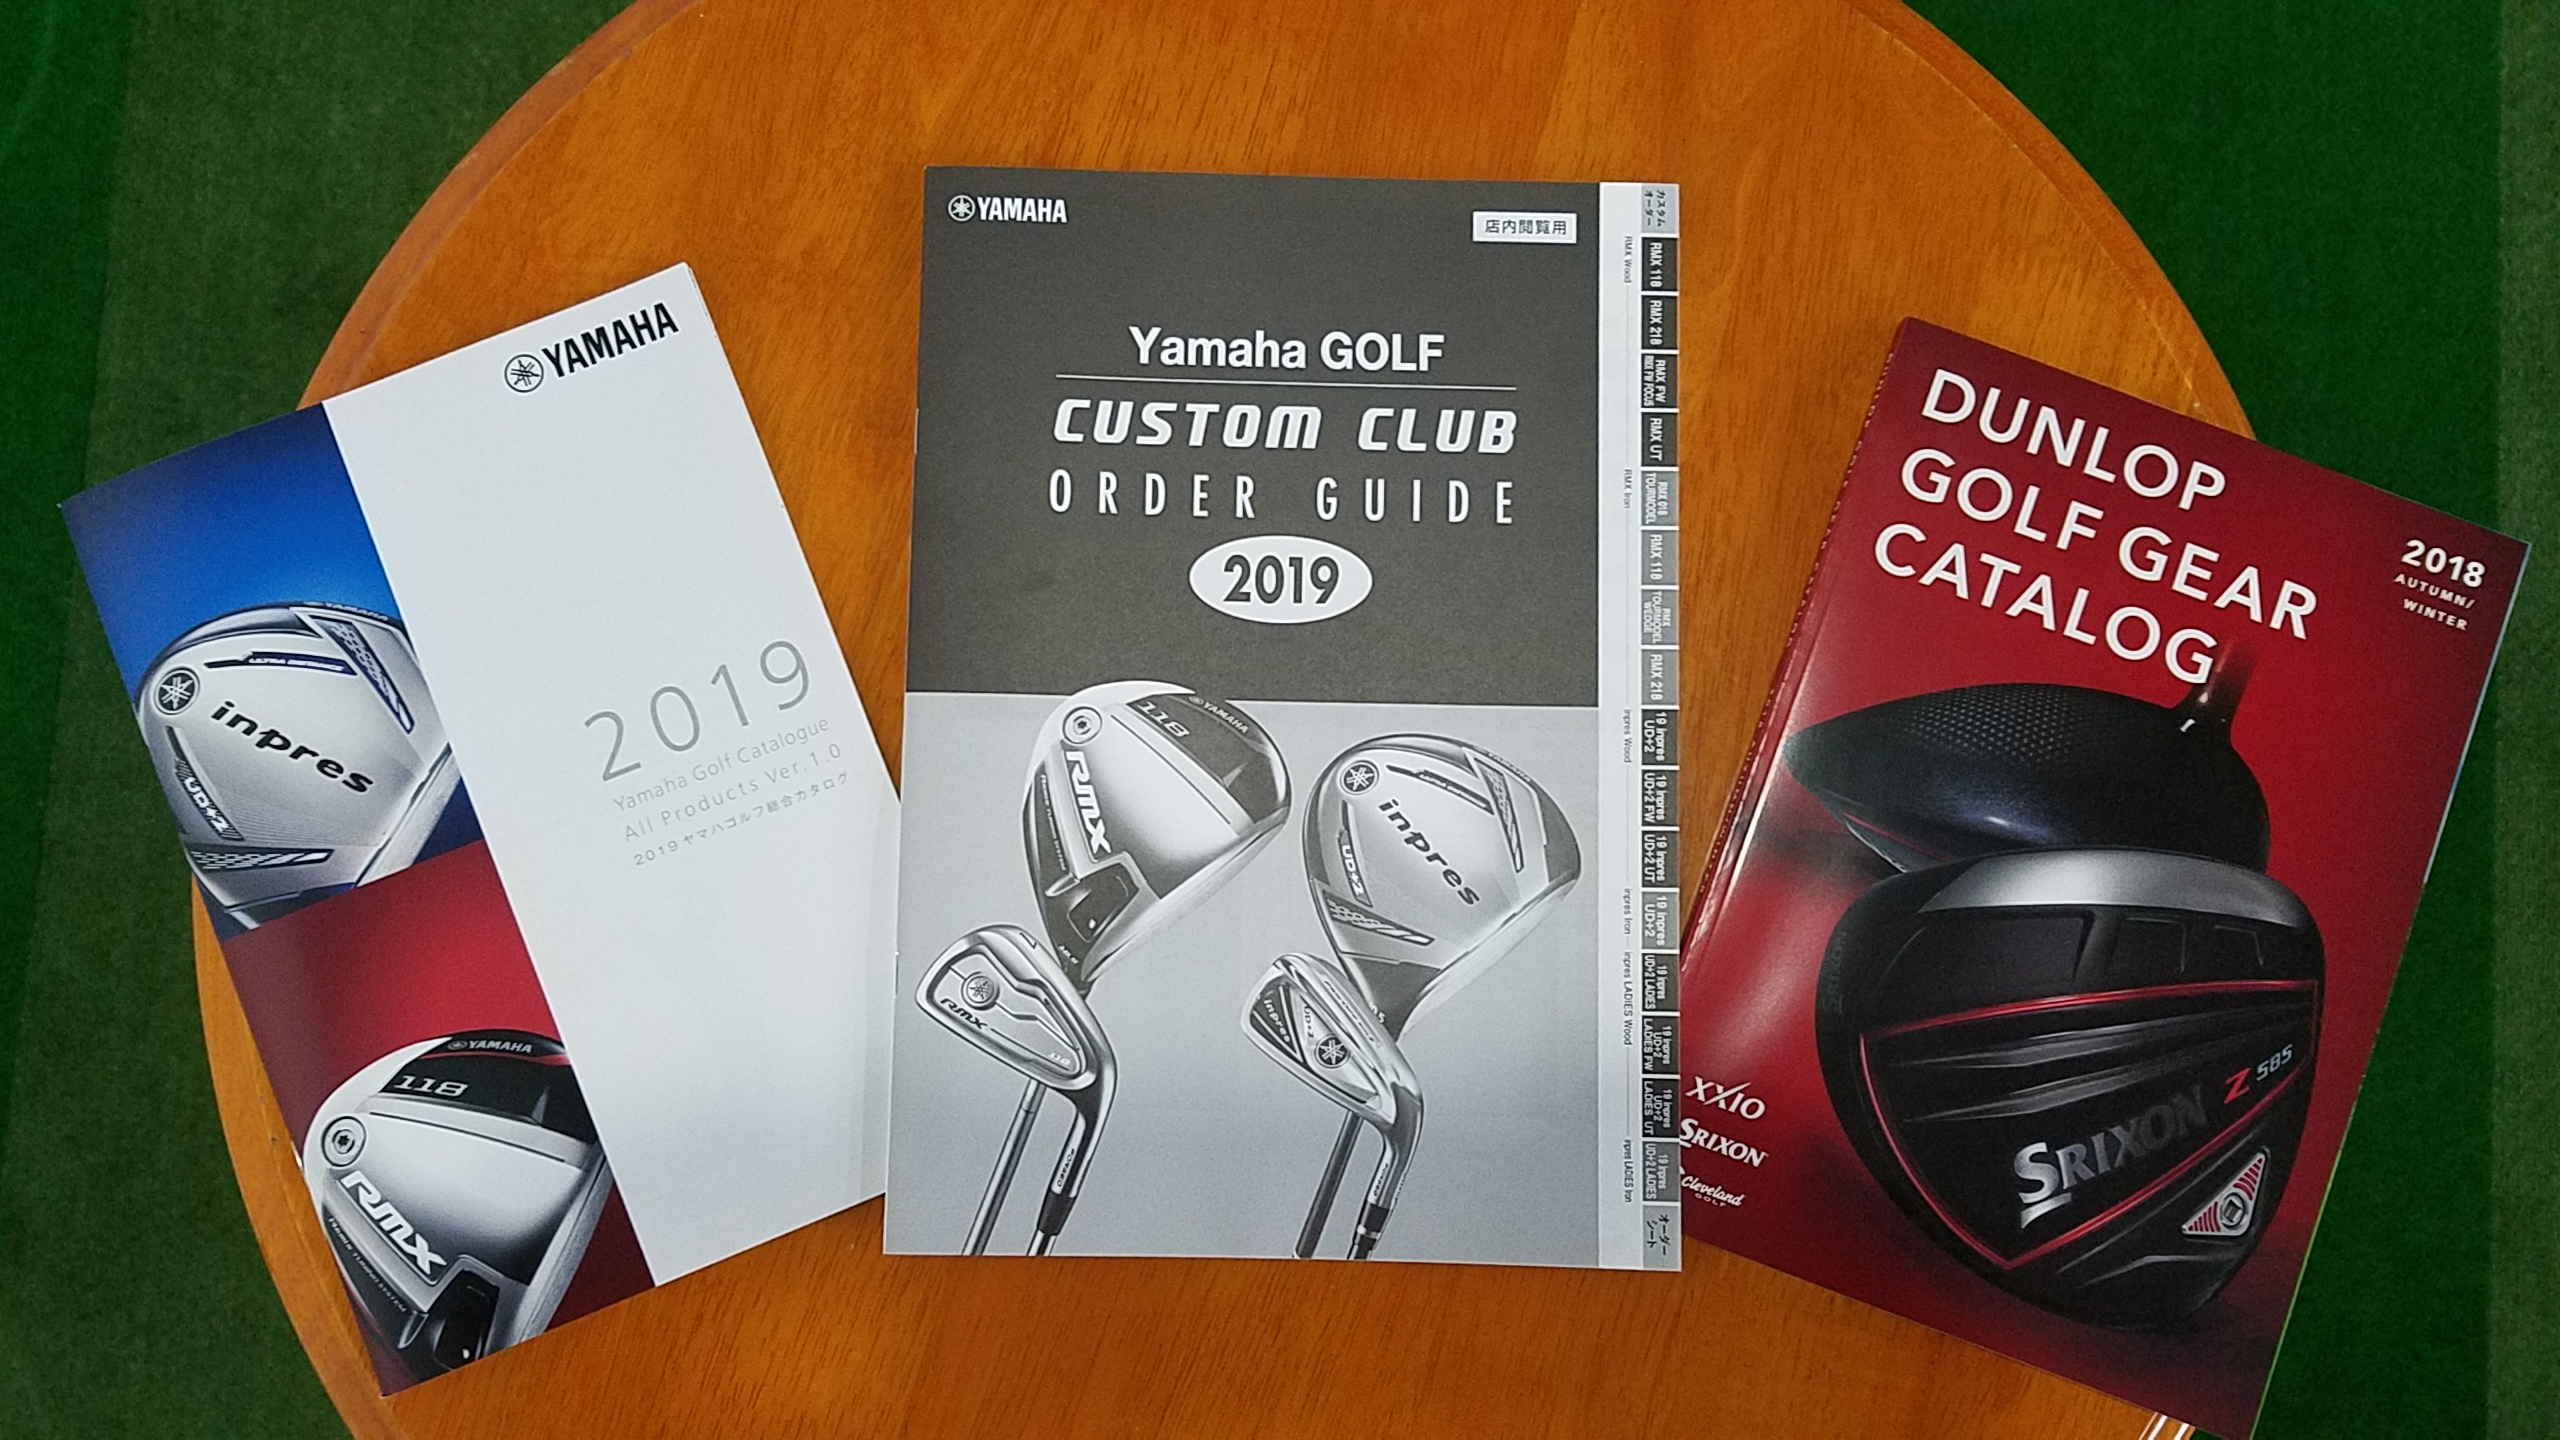 Yamaha inpres UD+2 メーカーカスタム